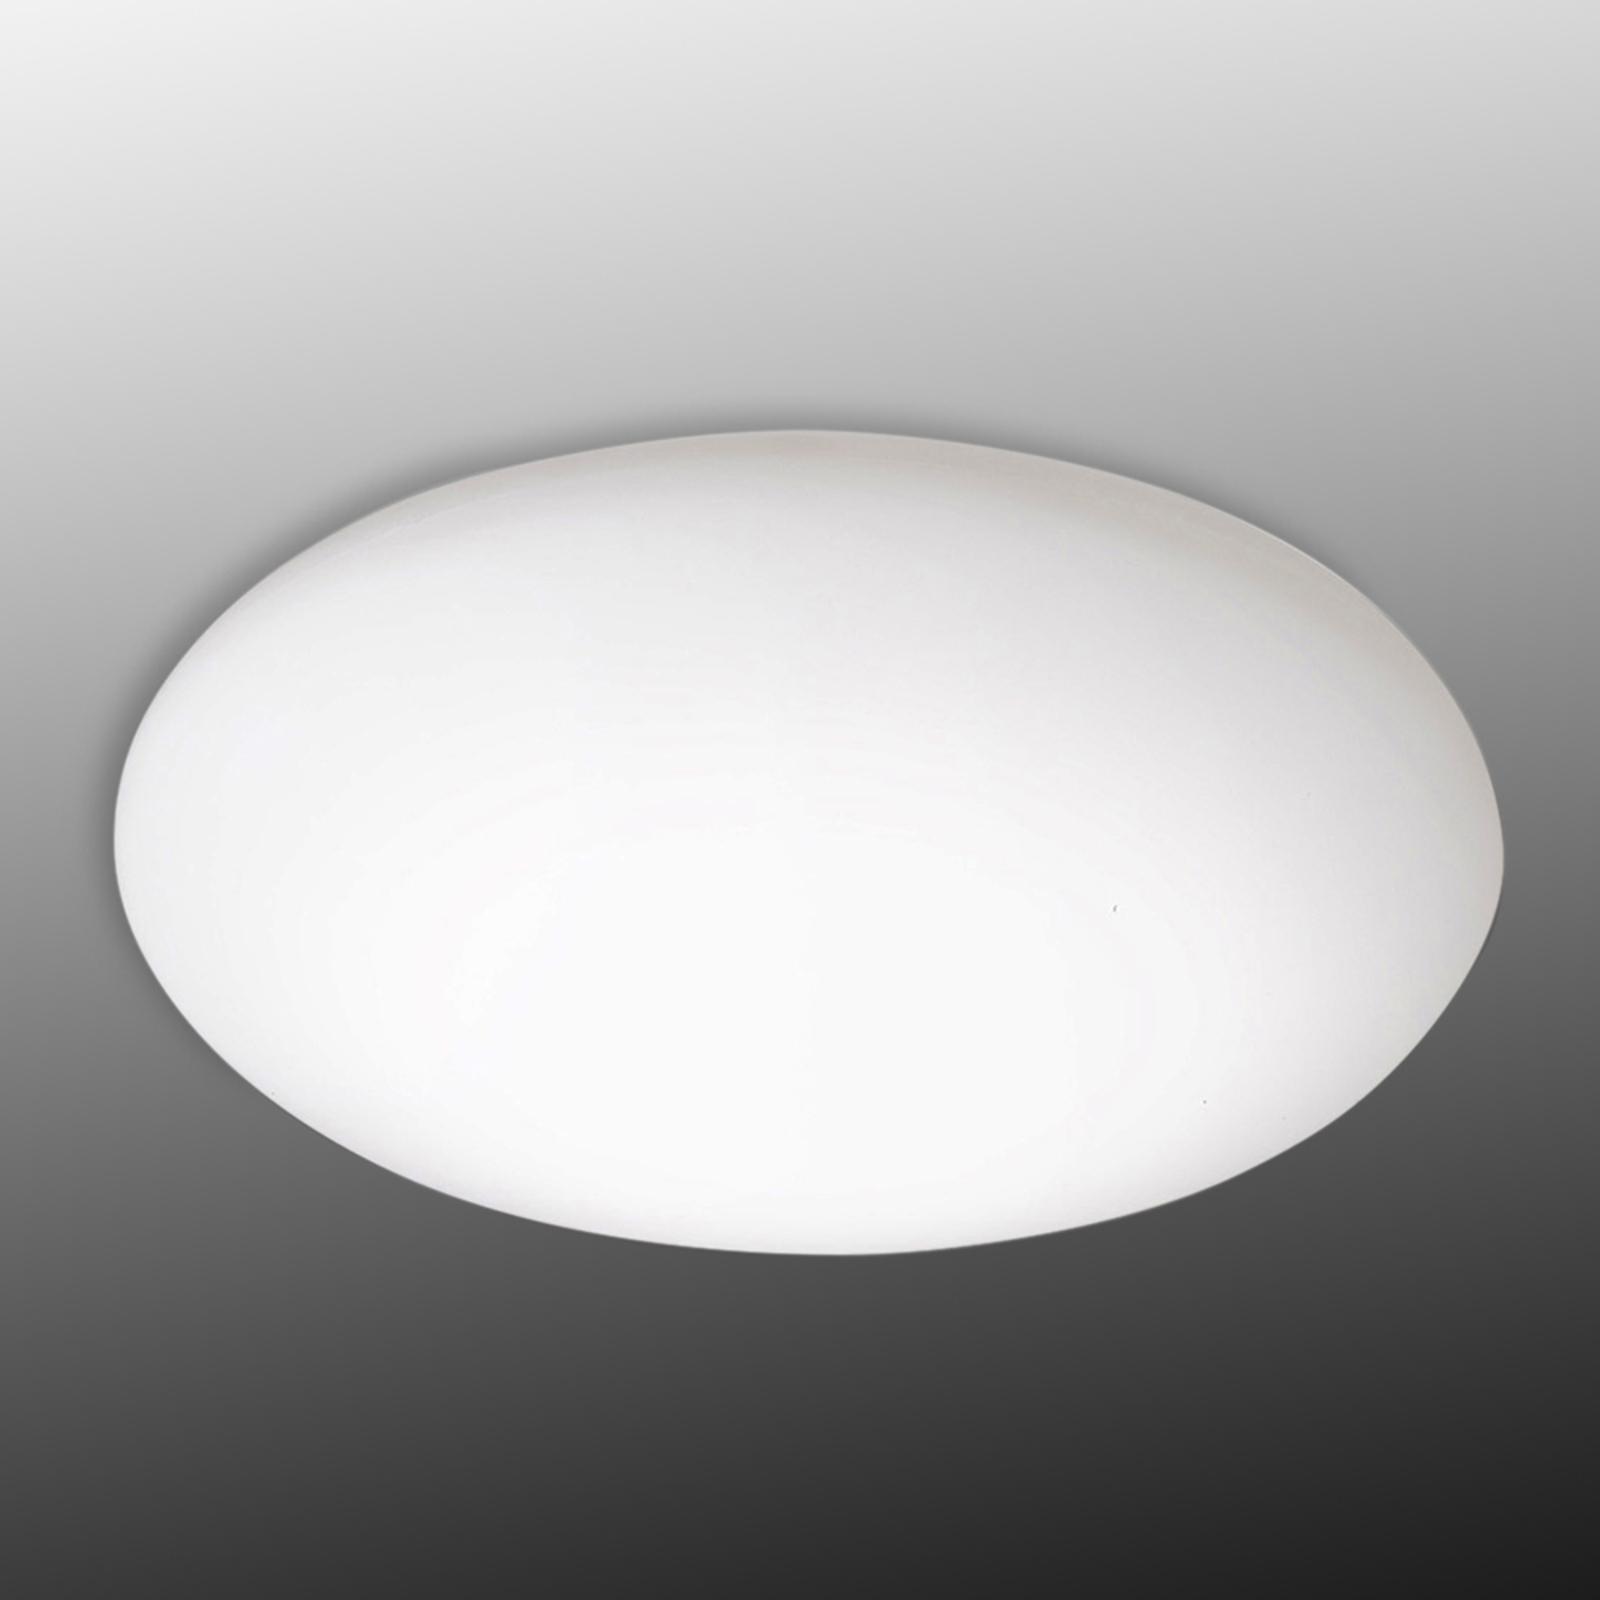 Squash - LED plafondlamp van polyethyleen